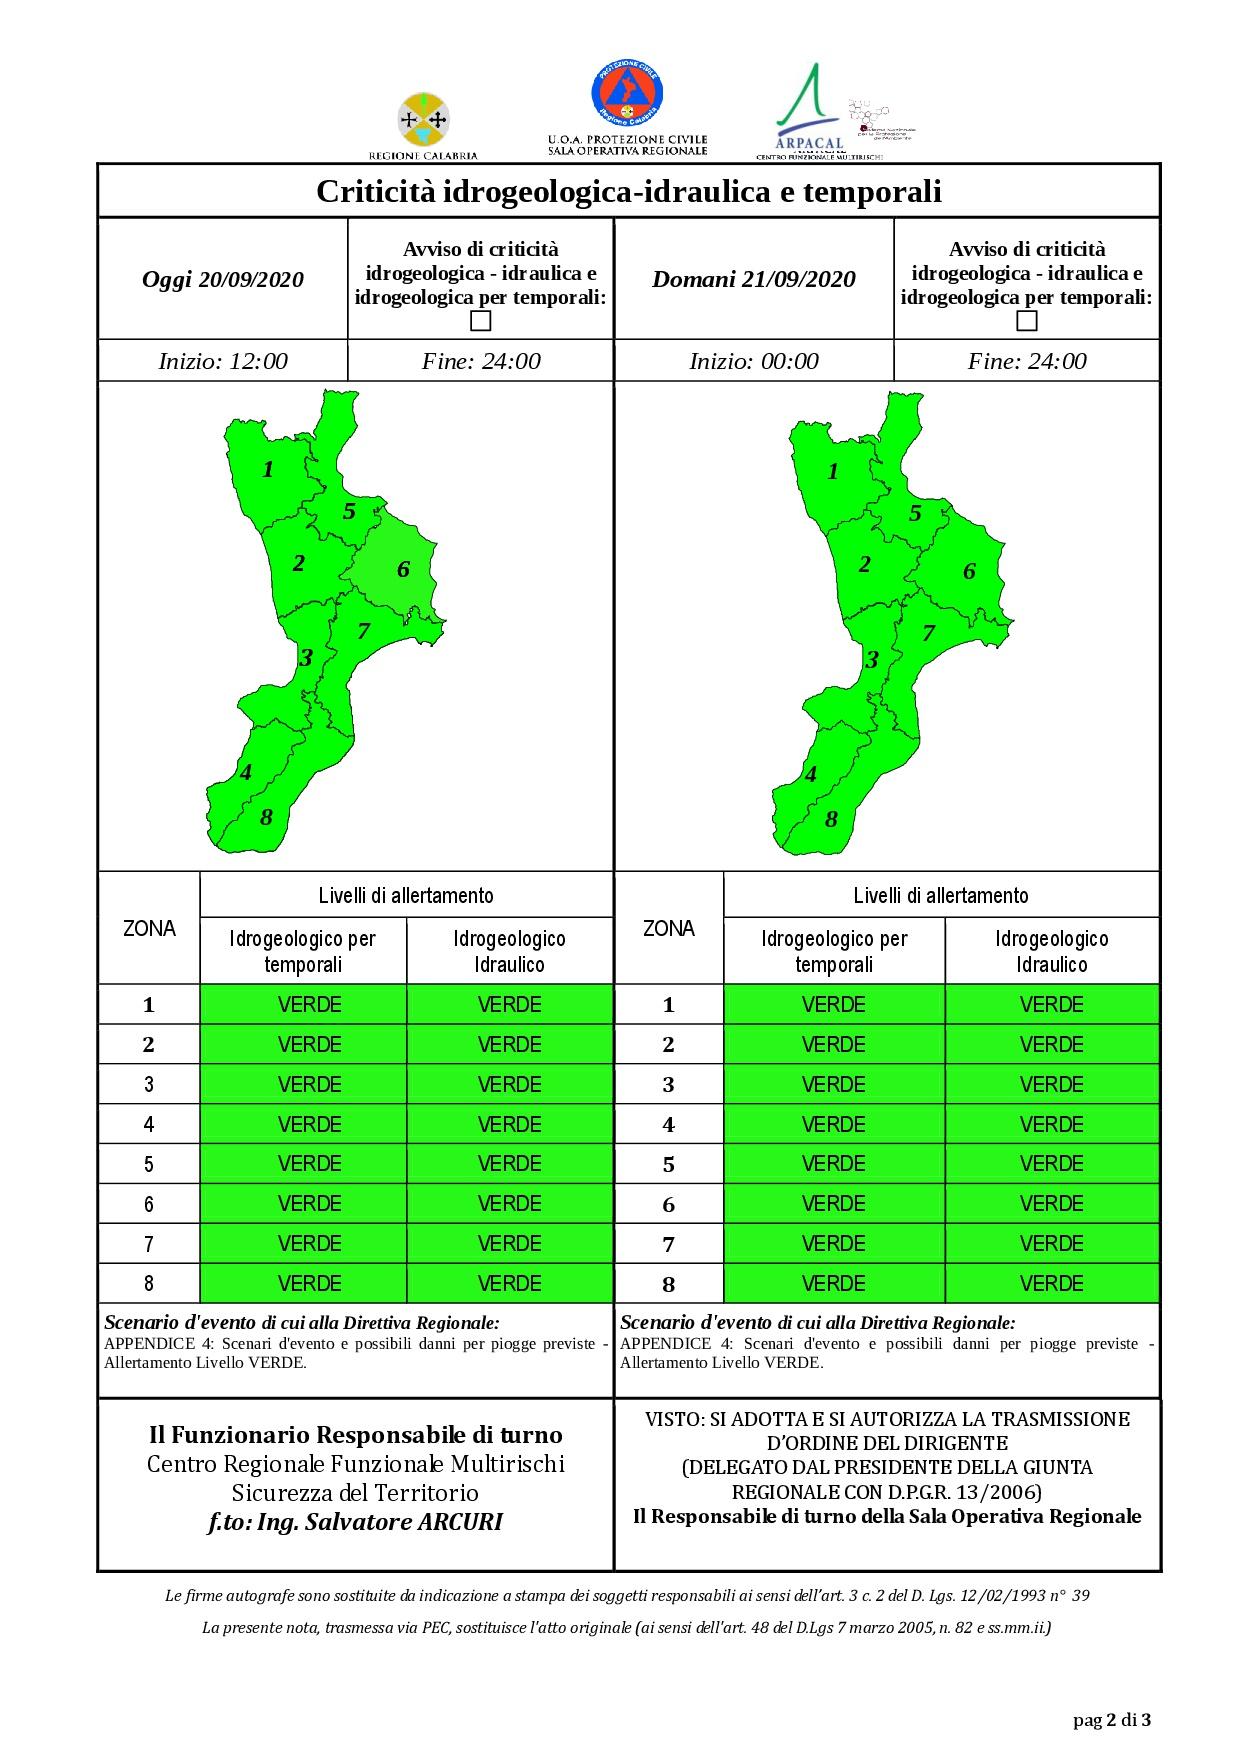 Criticità idrogeologica-idraulica e temporali in Calabria 20-09-2020